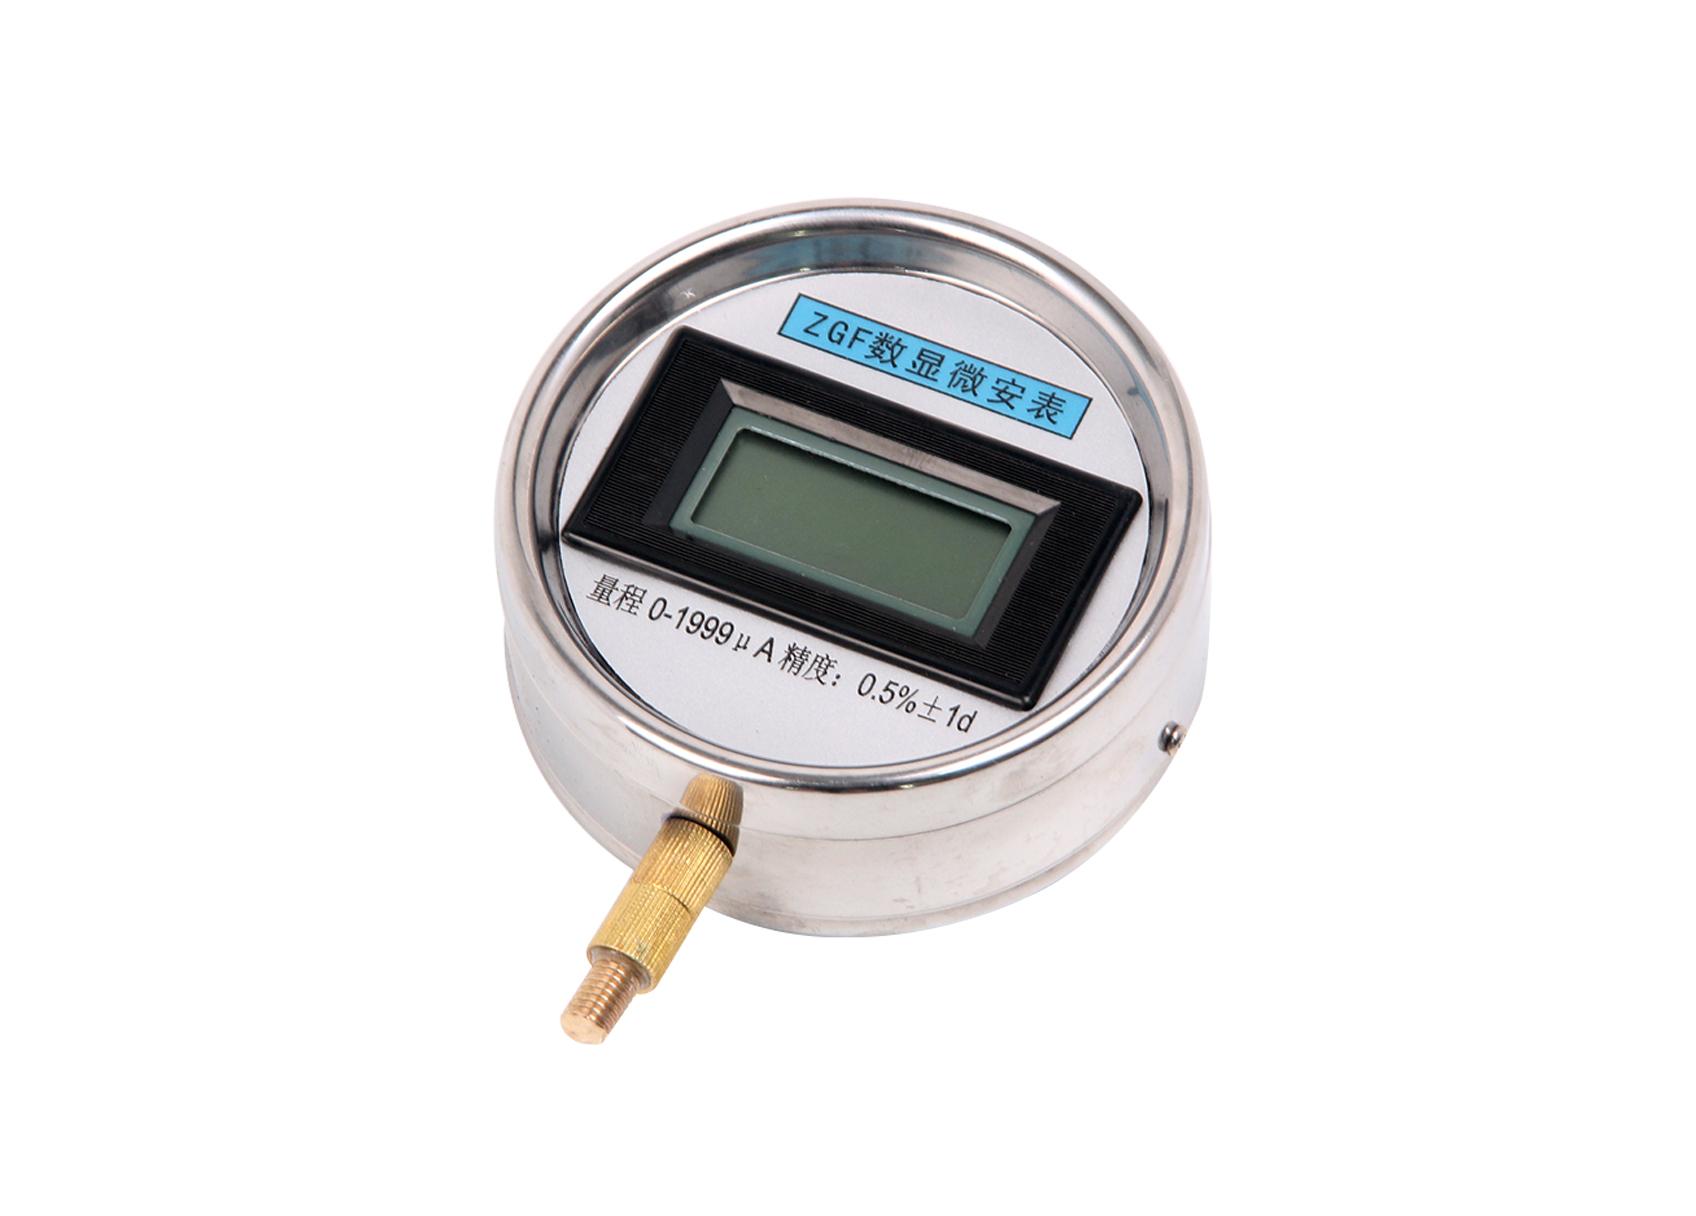 YTCZG-200kV/2mA直流高压发生器微安表